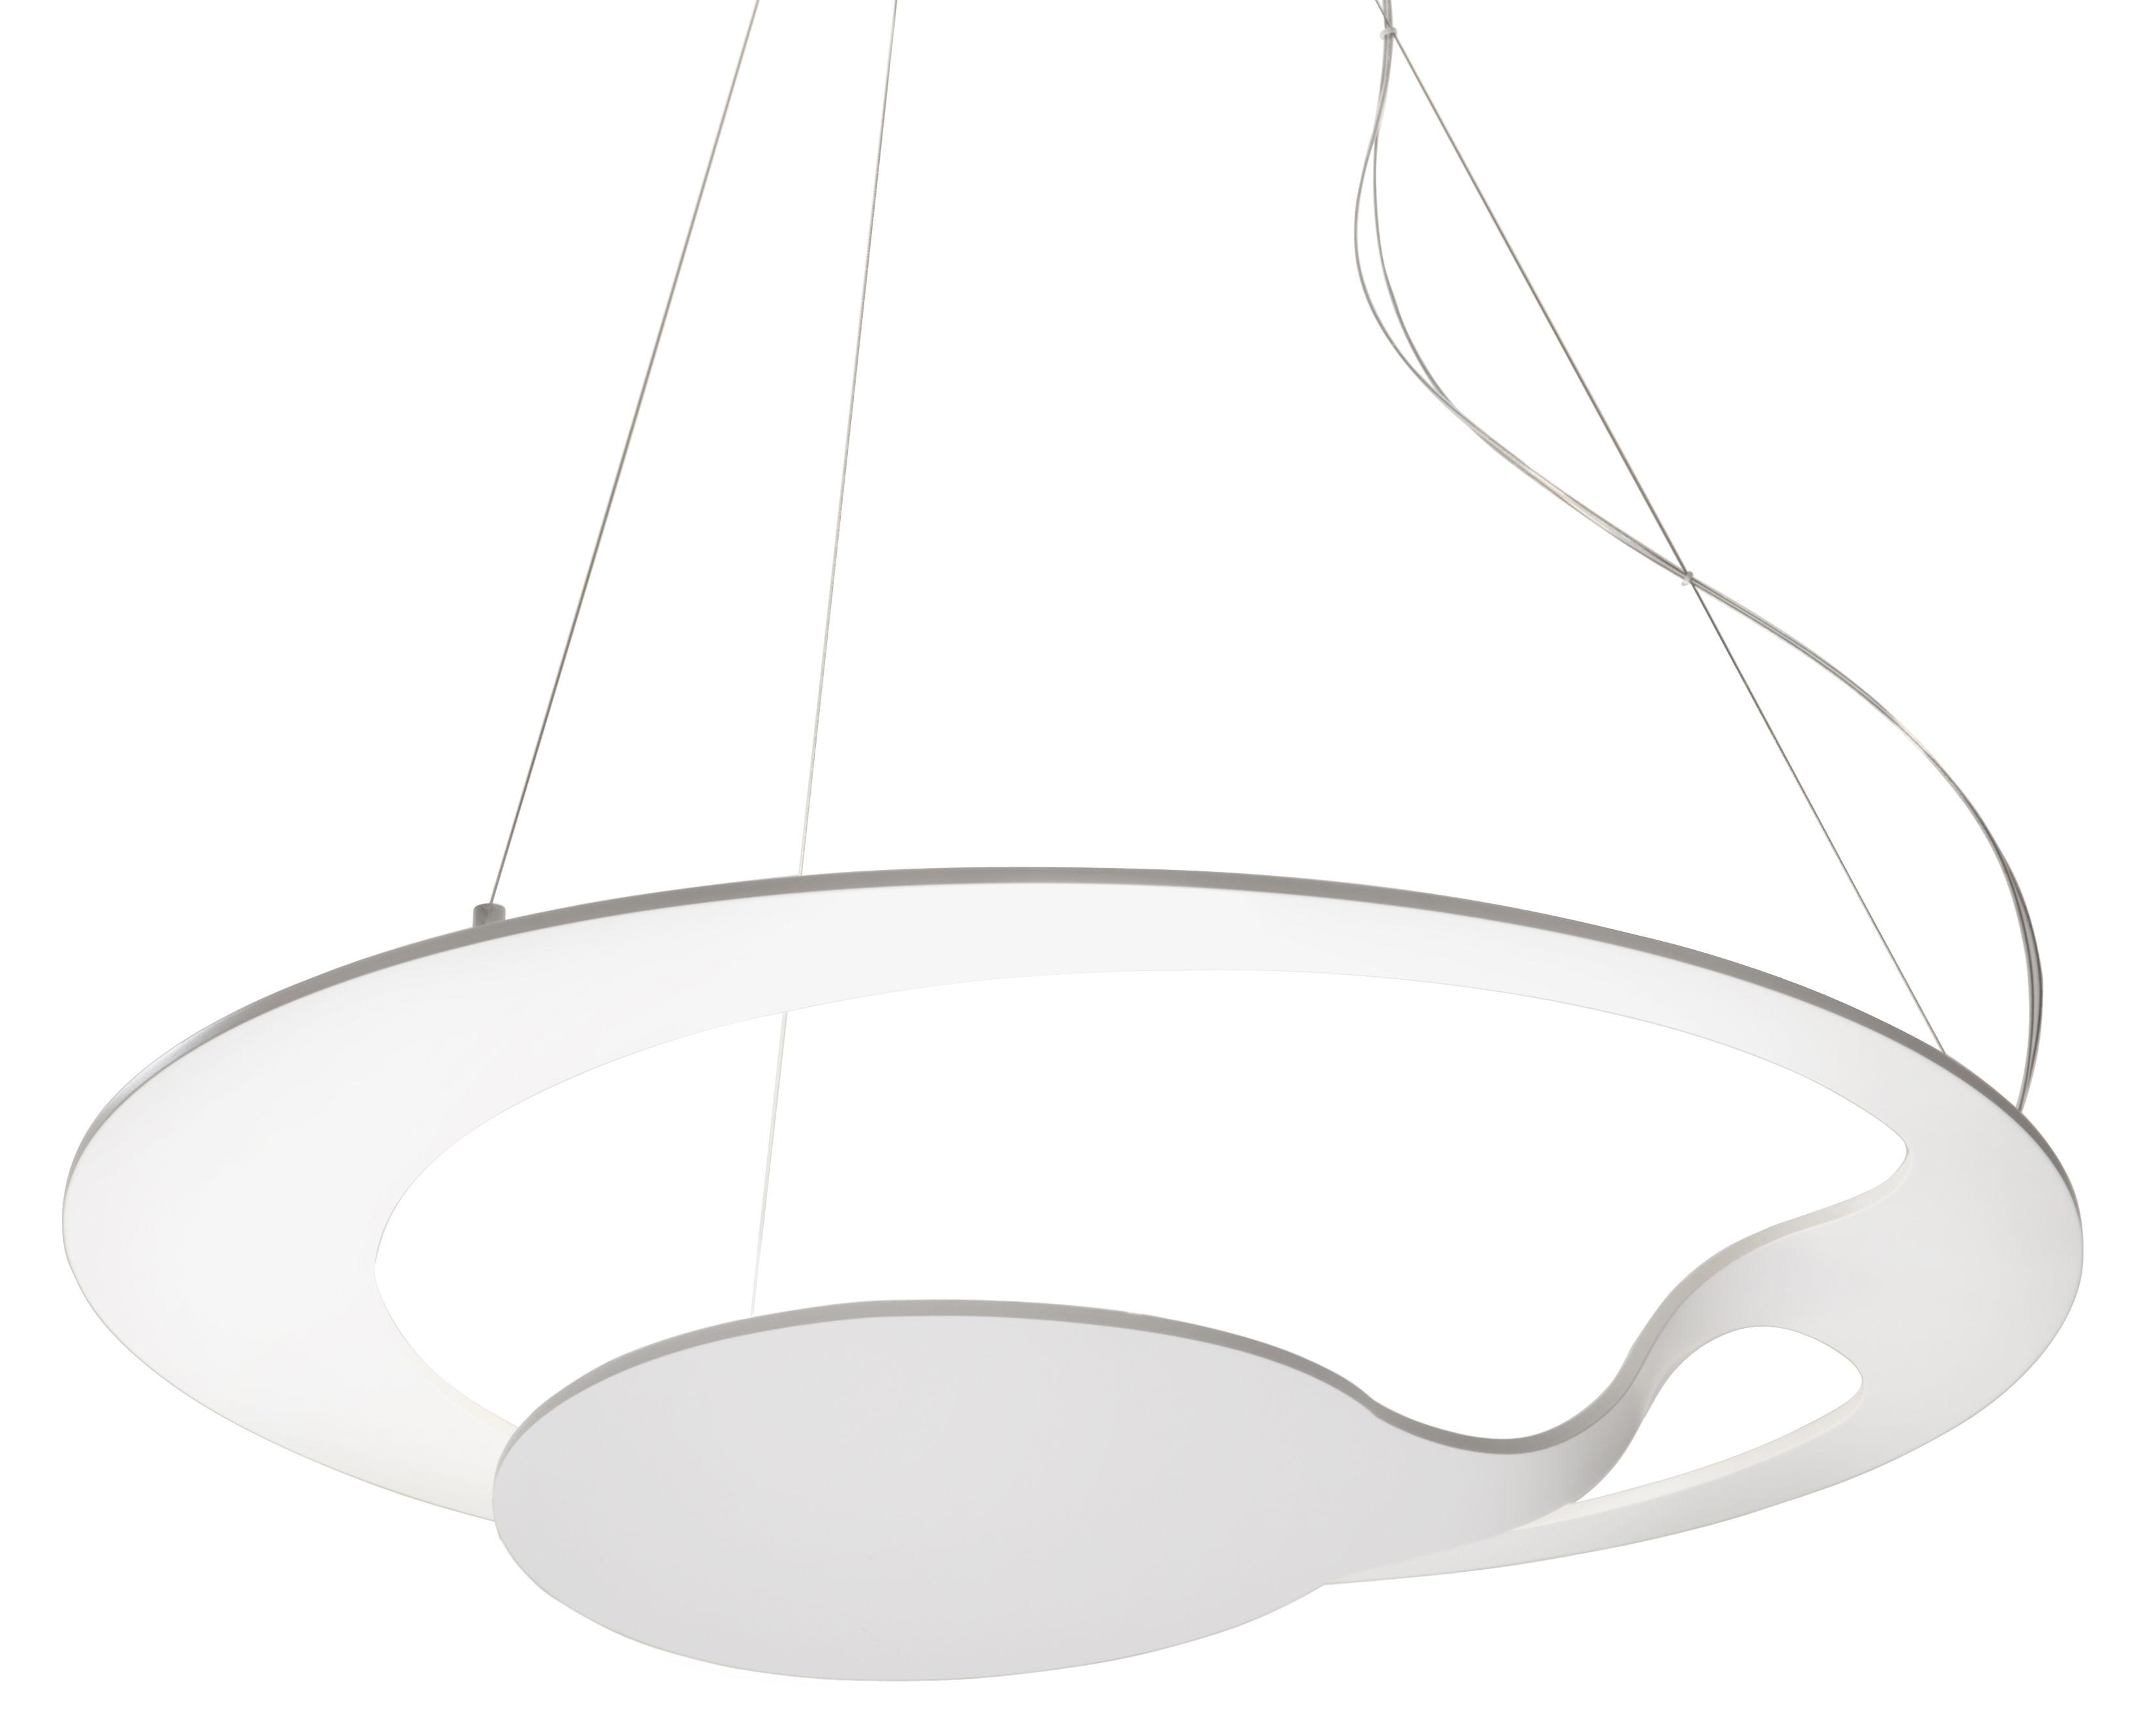 Lighting - Pendant Lighting - Glu Pendant by Fabbian - White - Painted aluminium